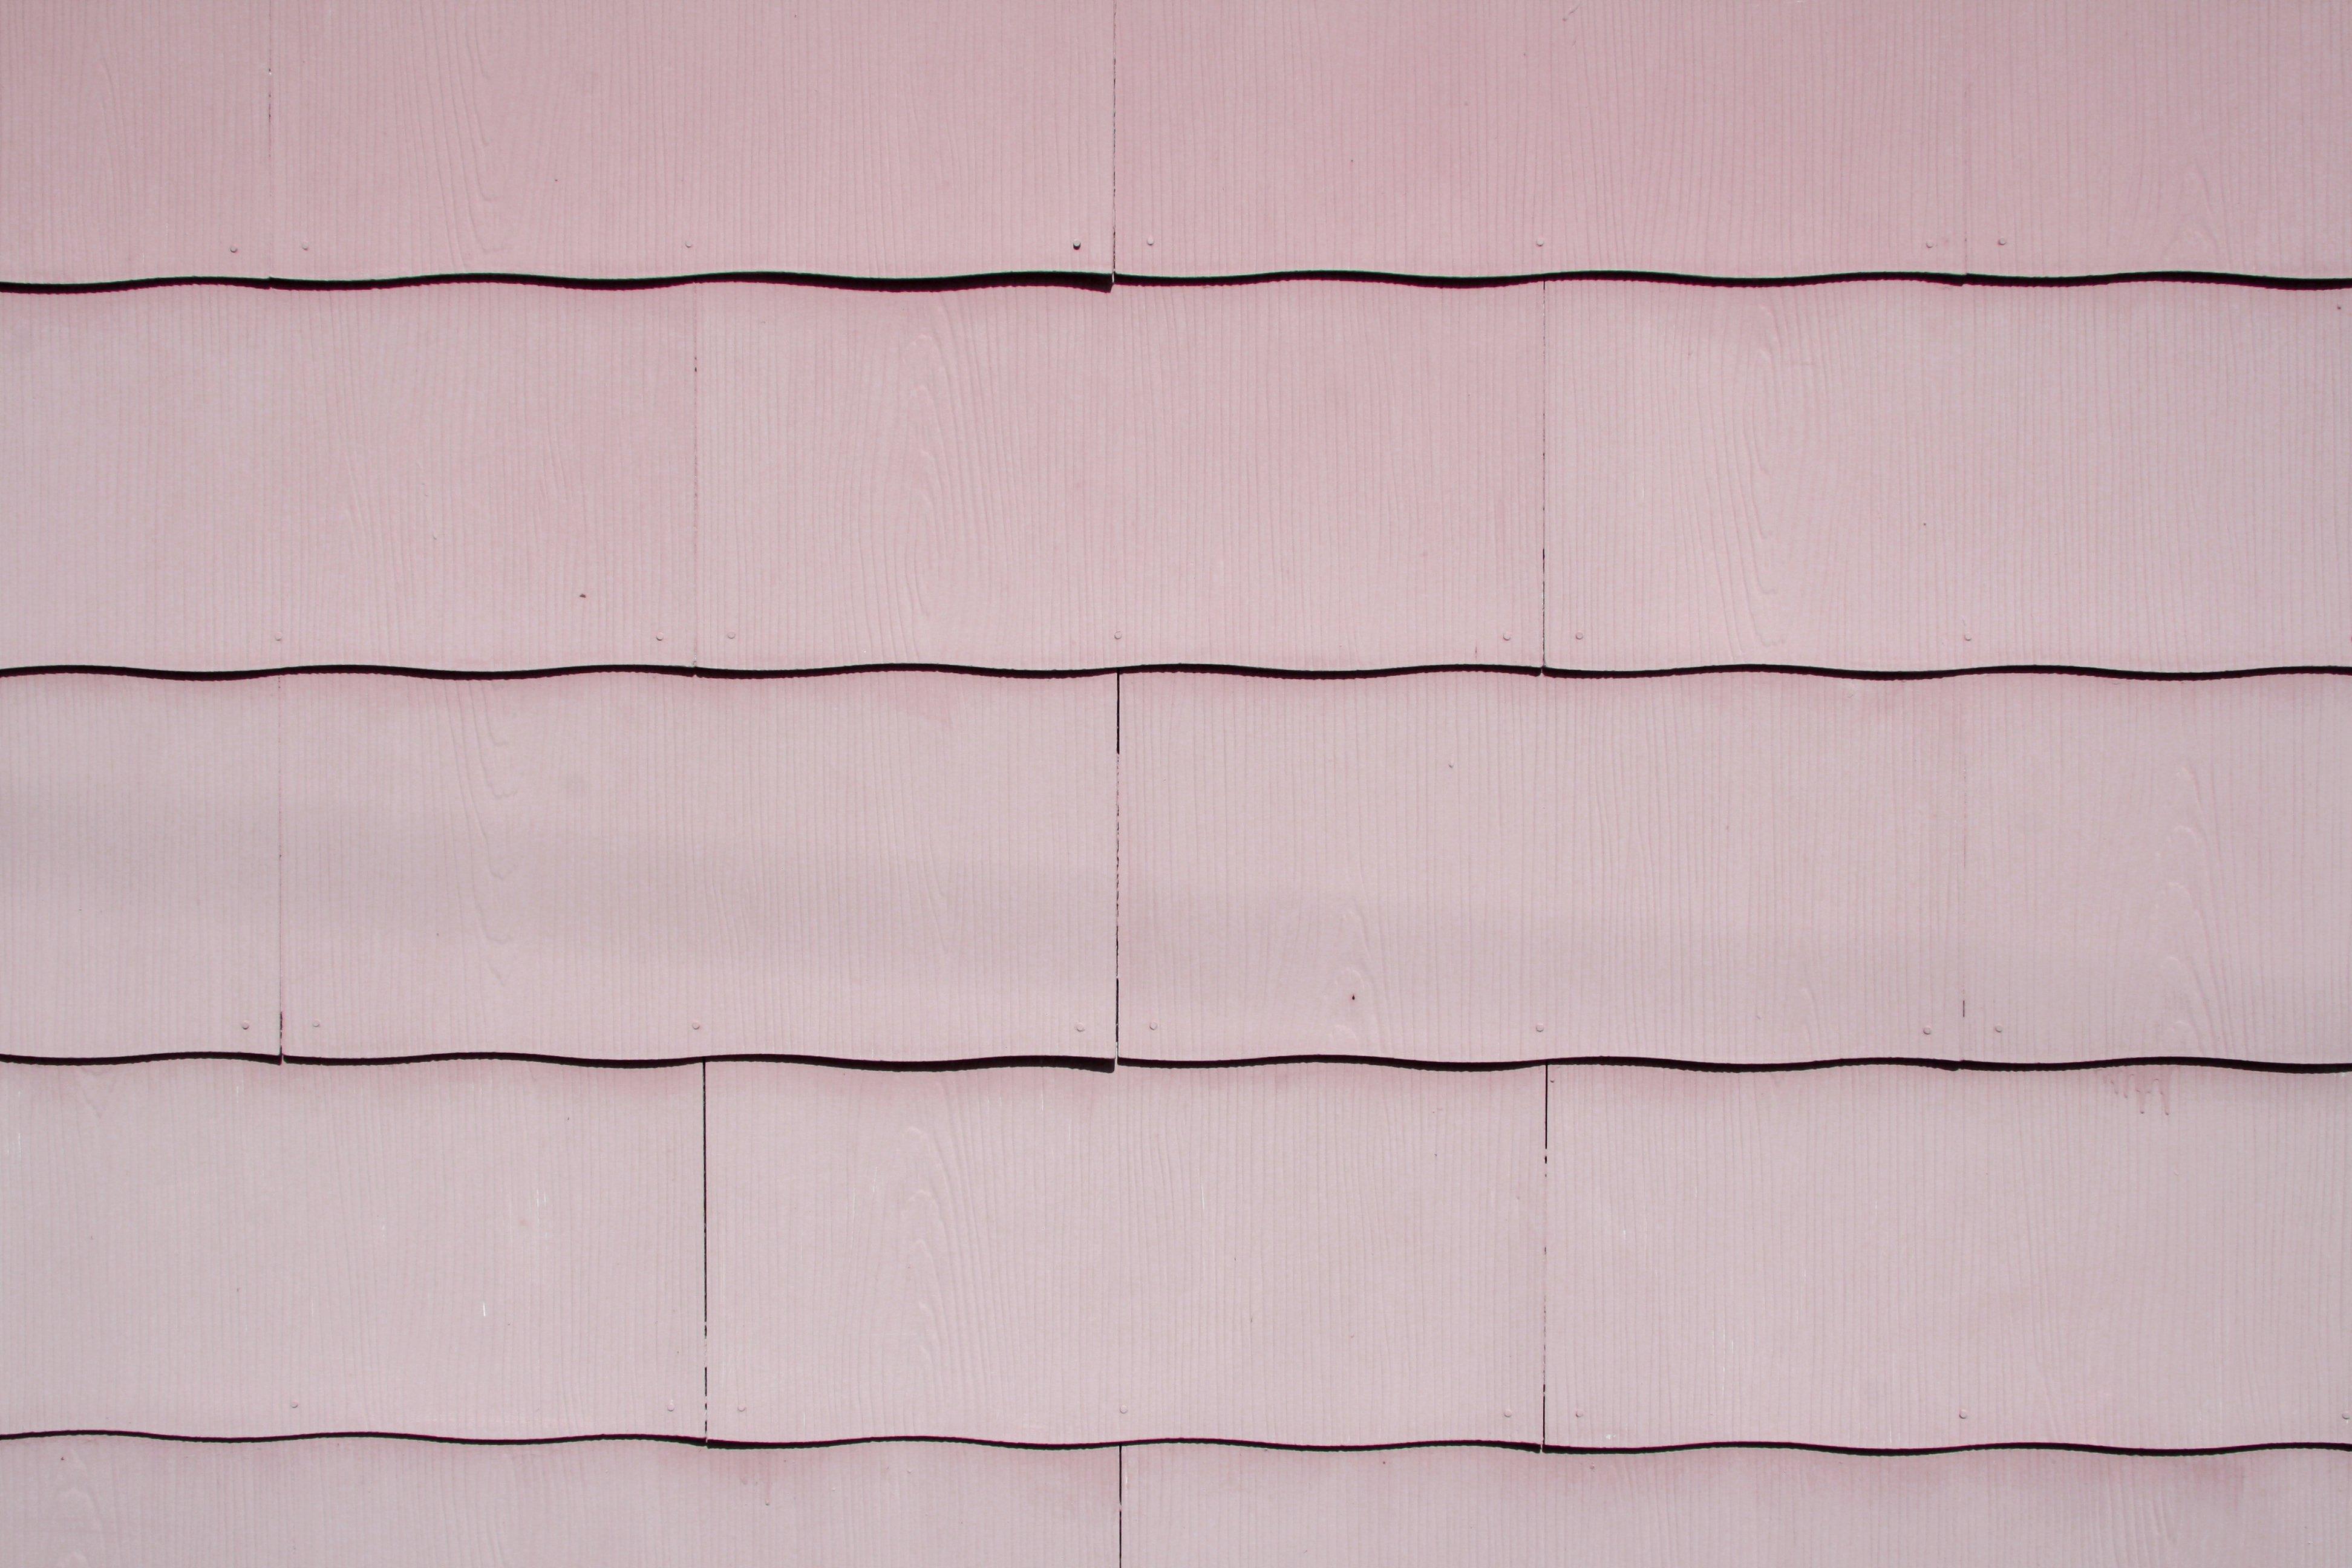 Rose Colored Scalloped Asbestos Siding Shingles Texture